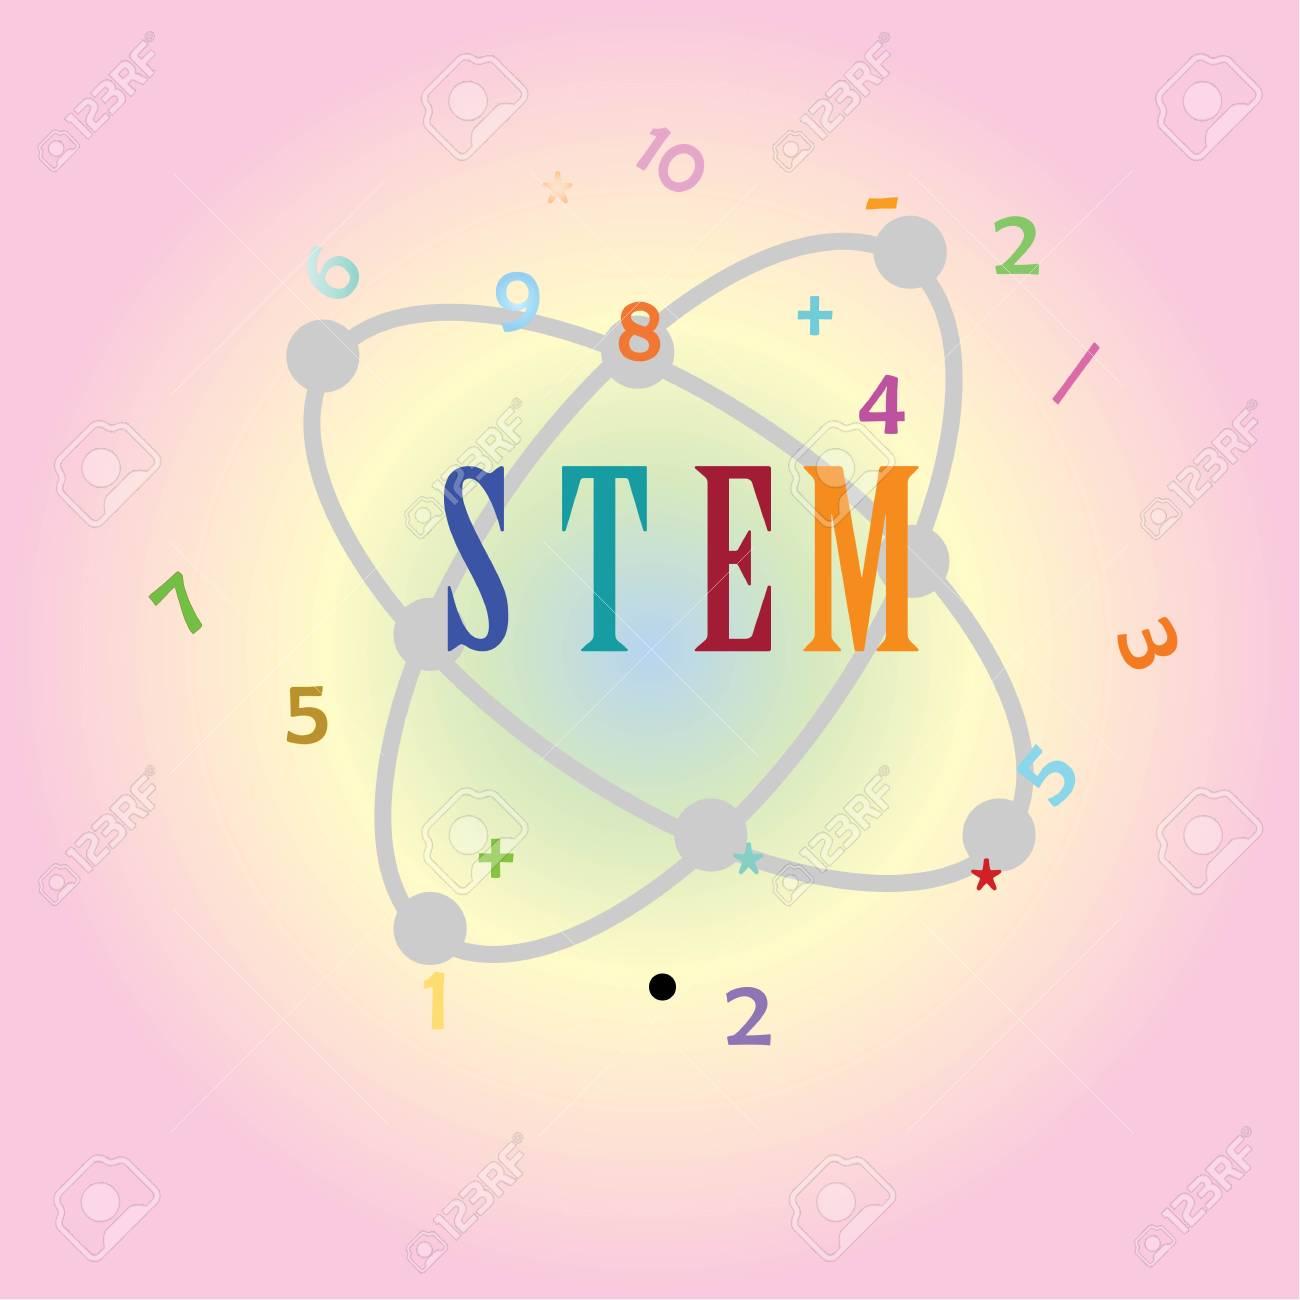 Fancy Math Education Com Photo - Worksheet Math for Homework ...